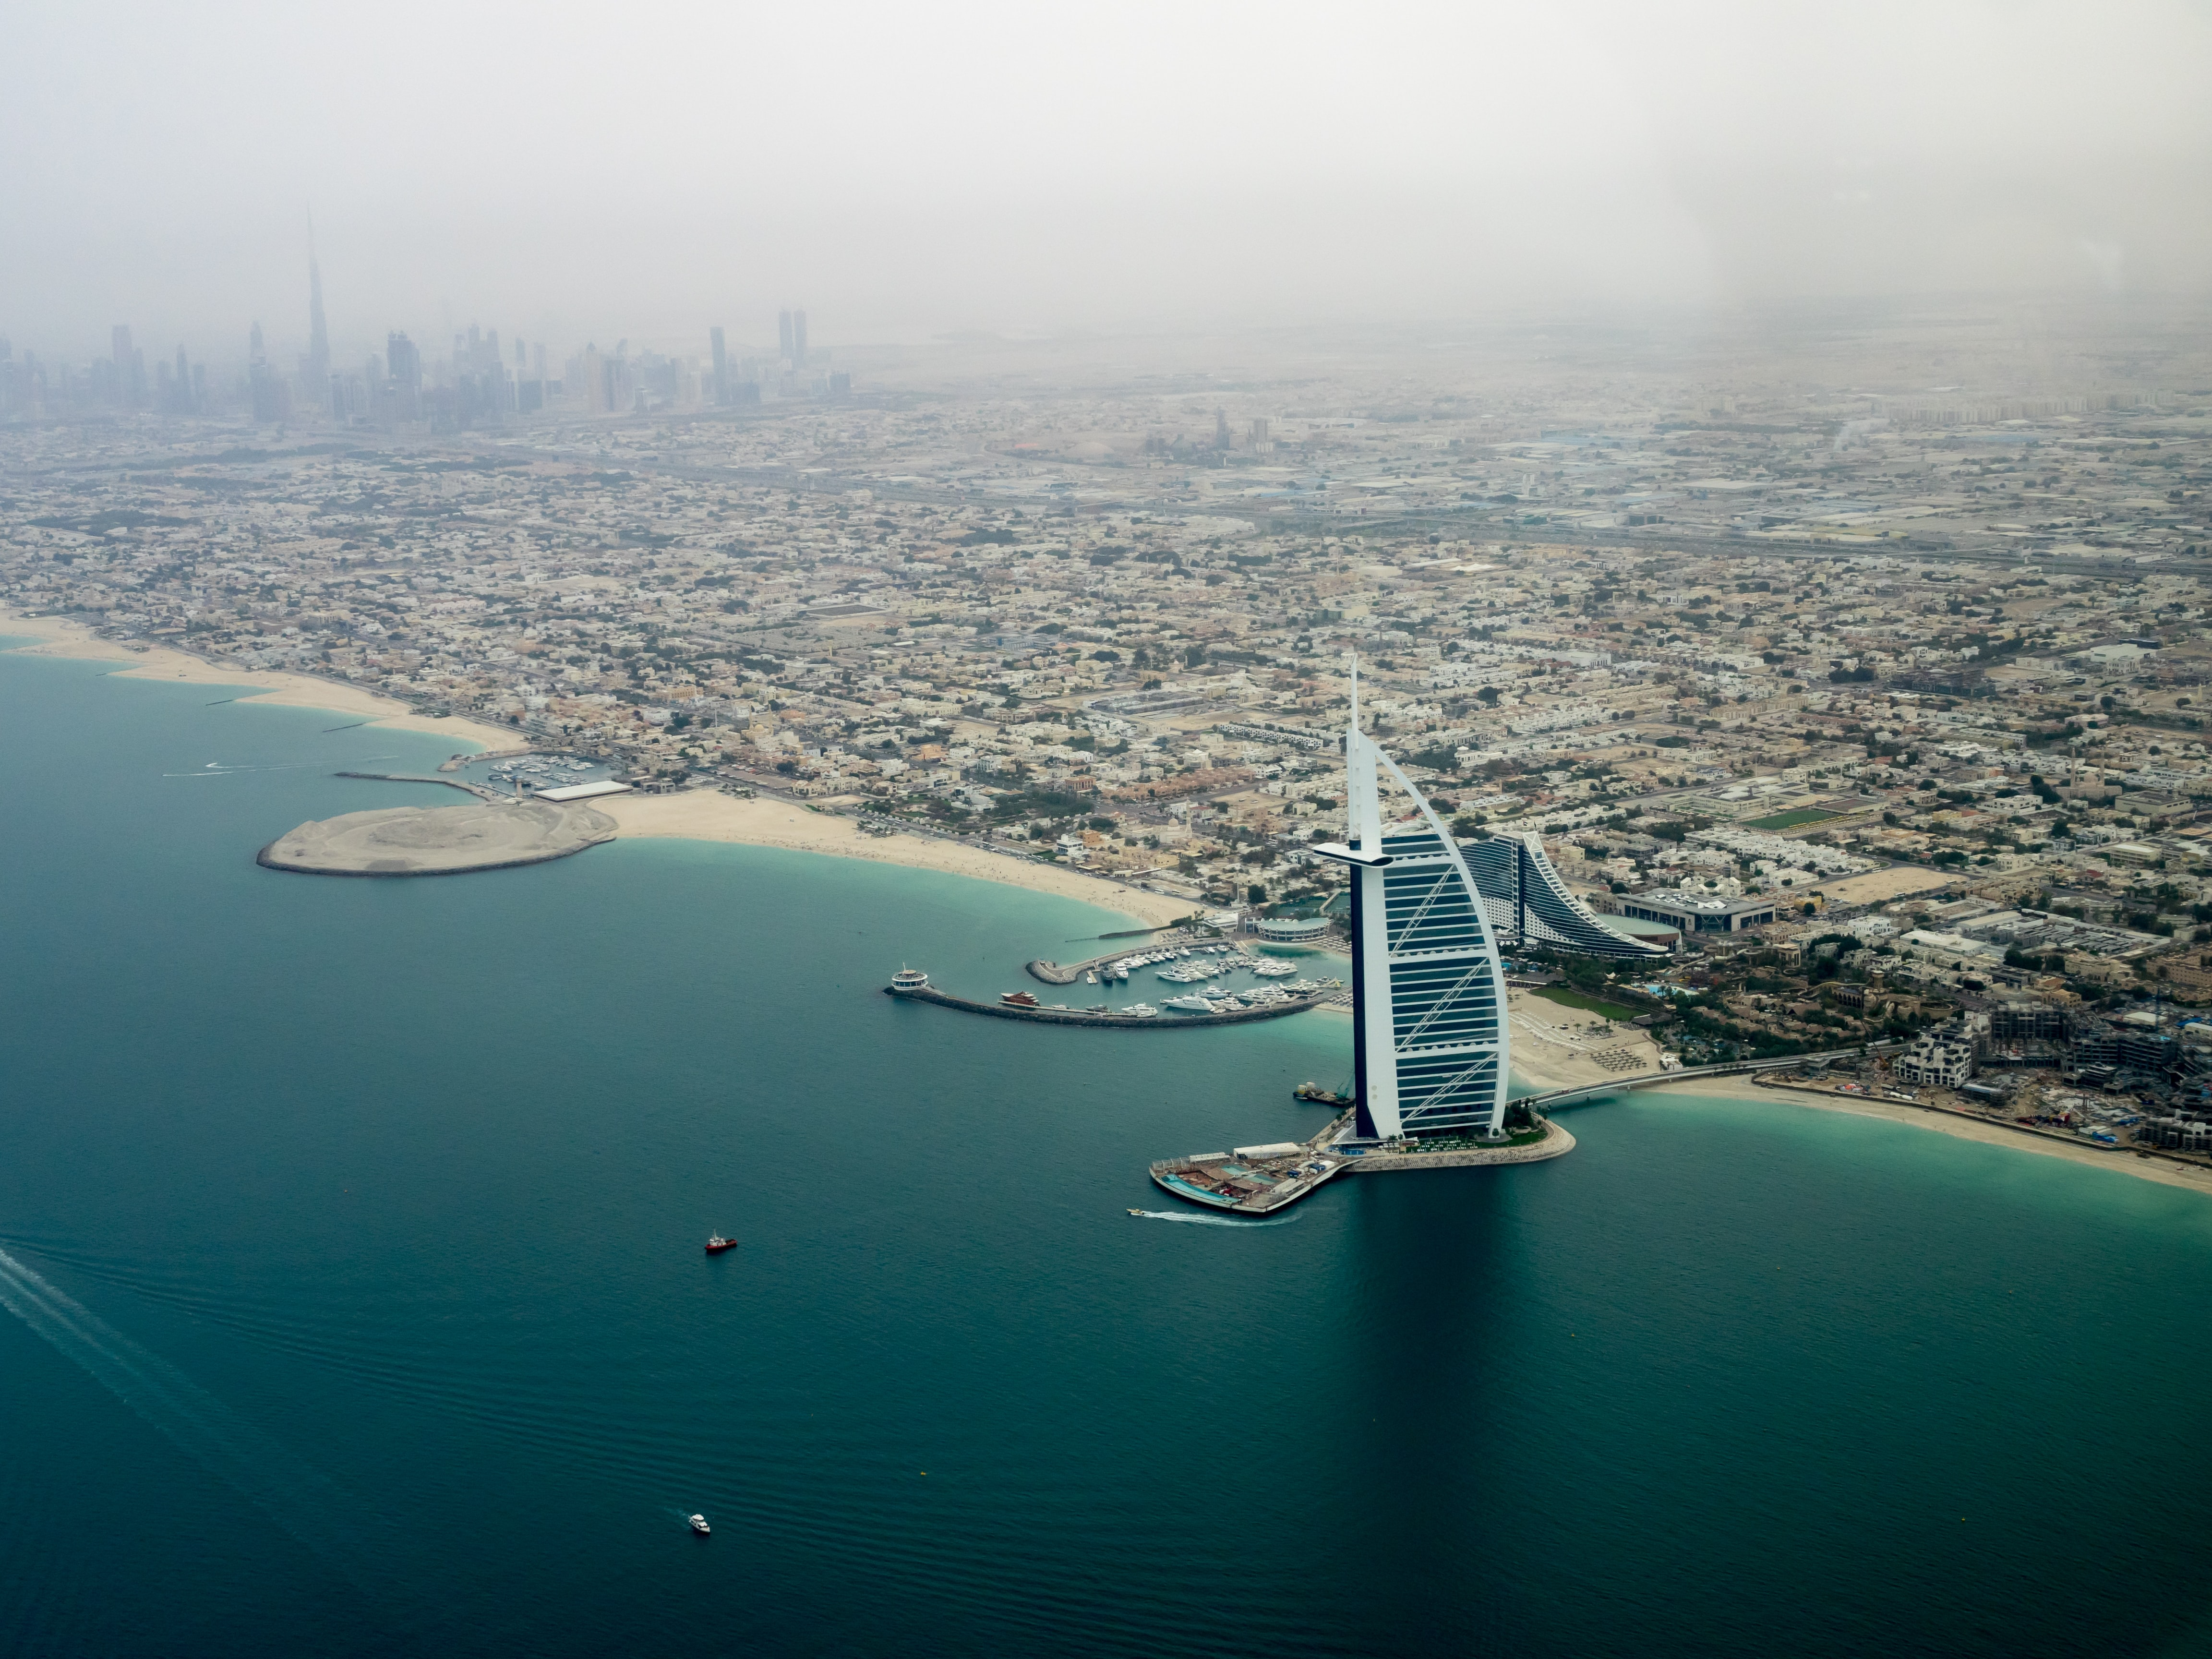 Drone shot of the marina in Dubai with the tall Burj Al Arab hotel